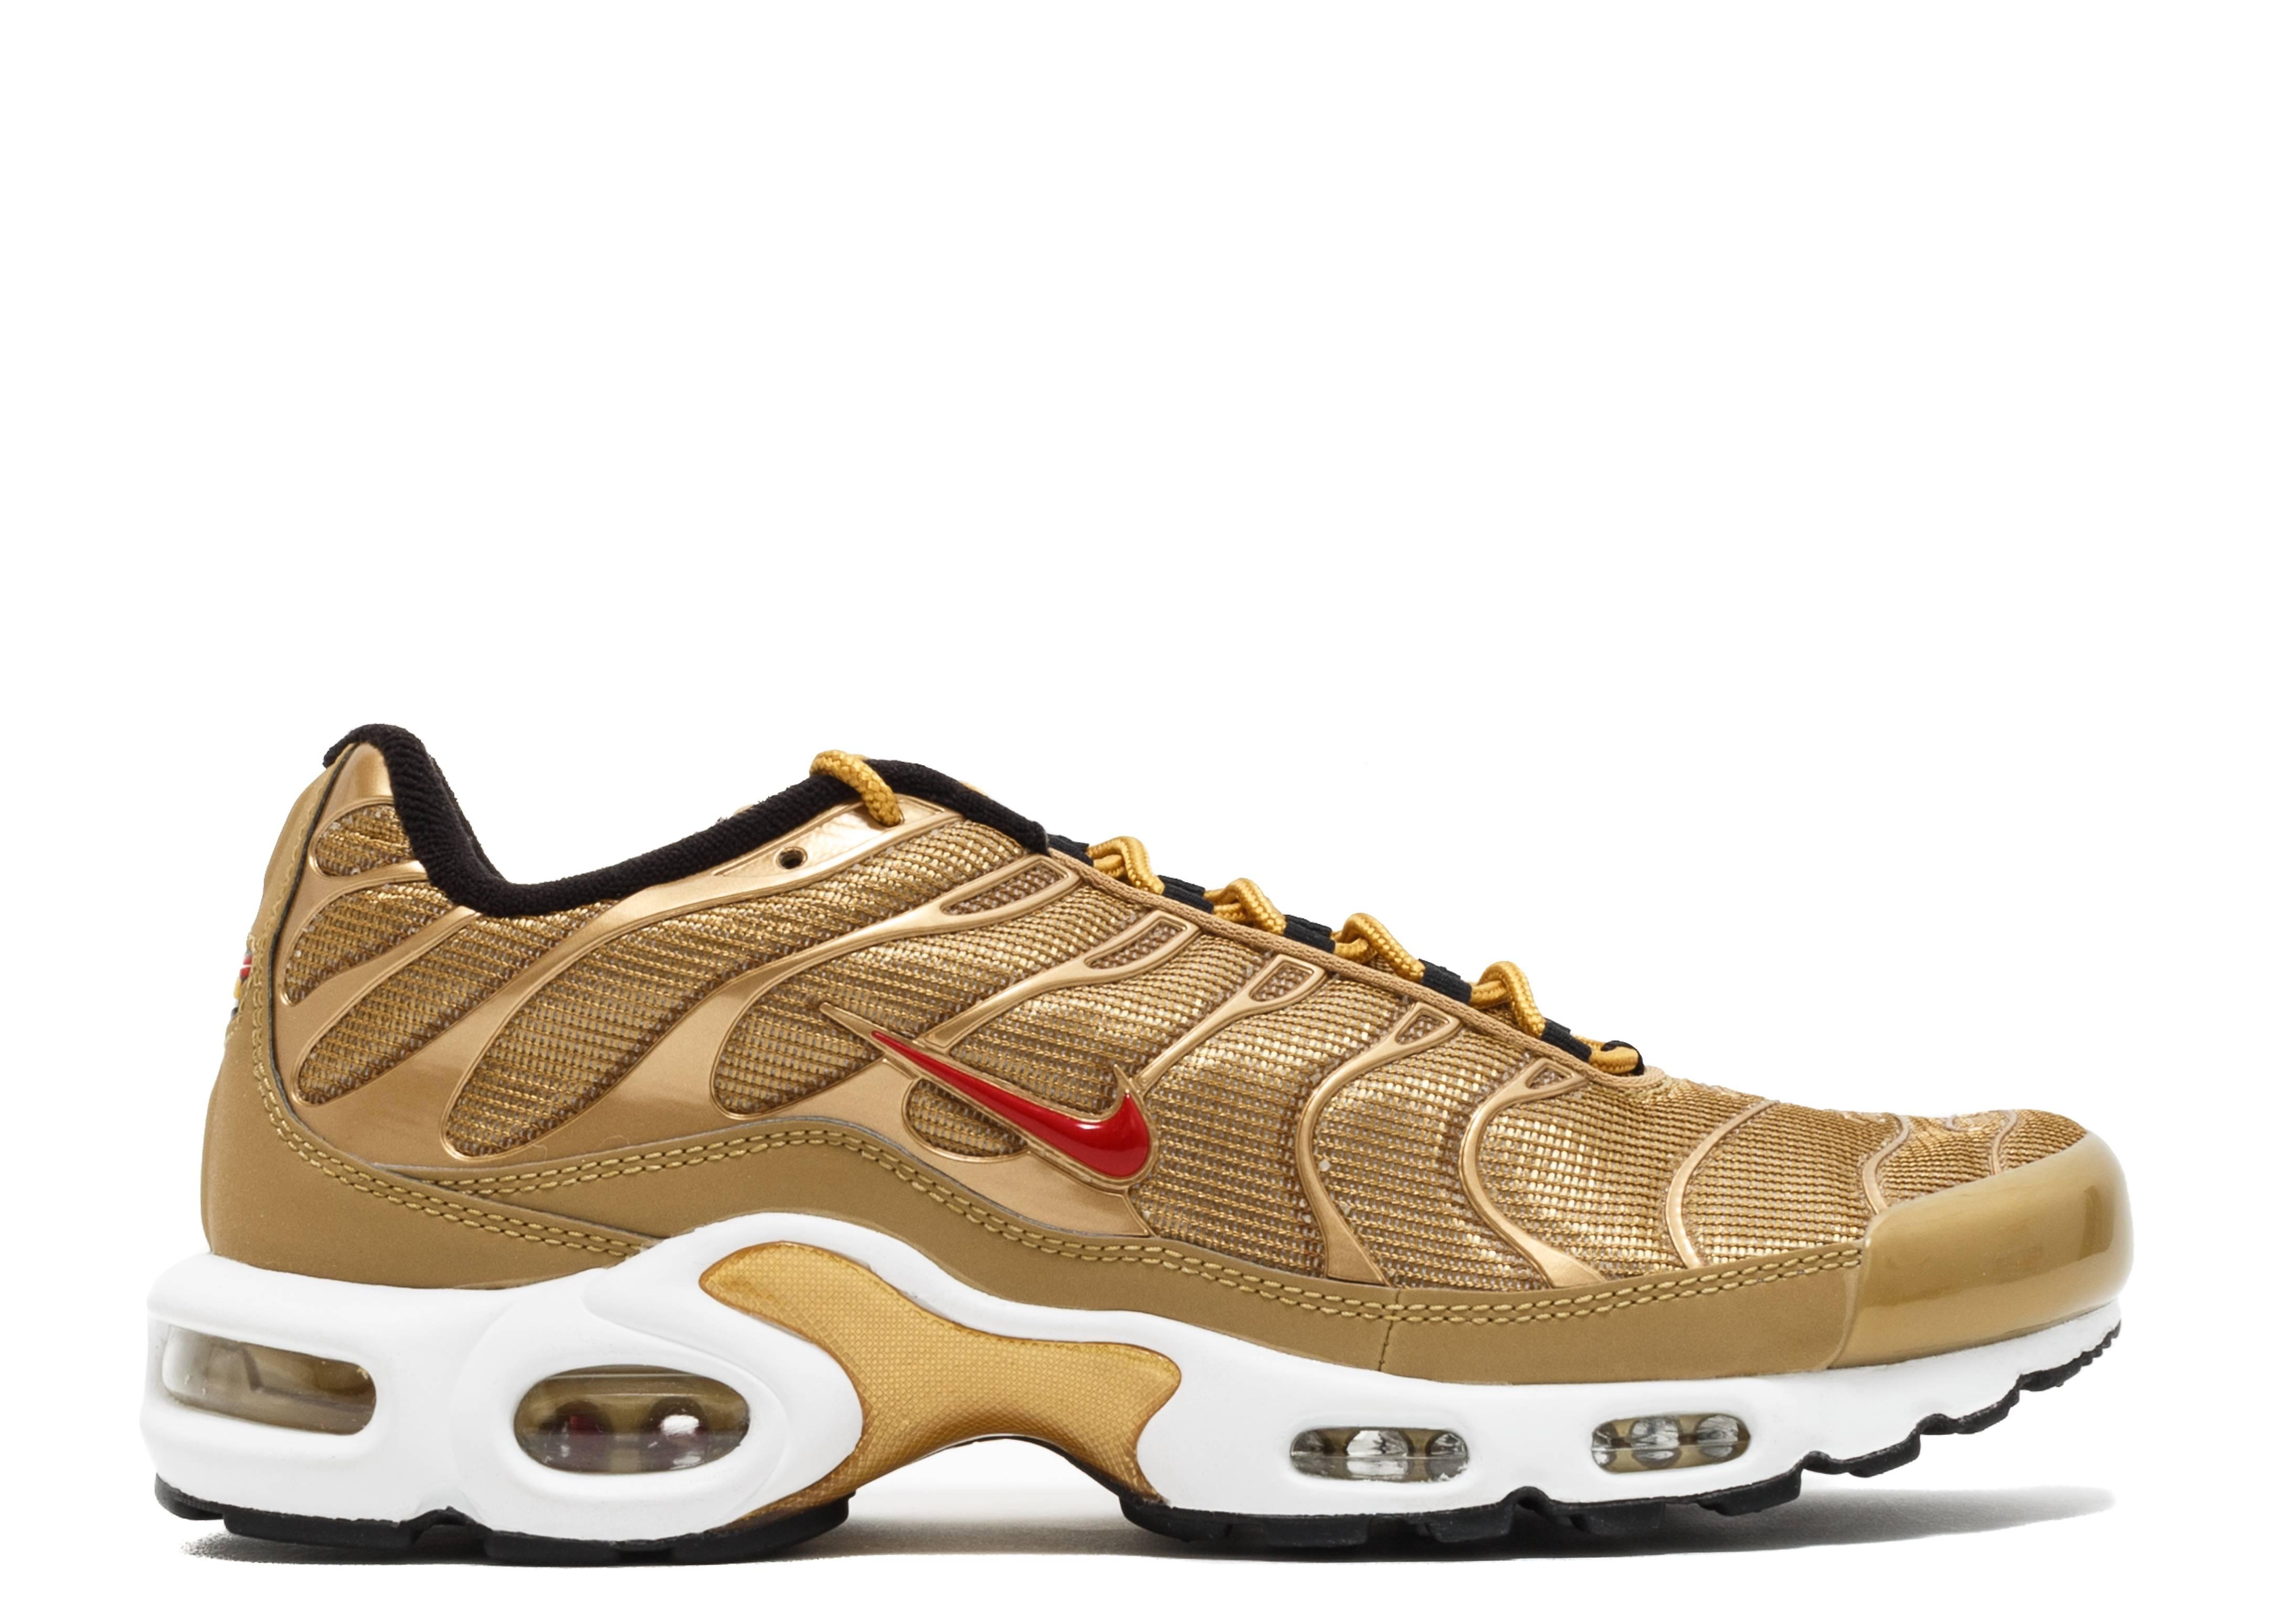 Rea Billiga Kvinnor Nike Air Max 97 Guld Vit Rosa Gul Skor